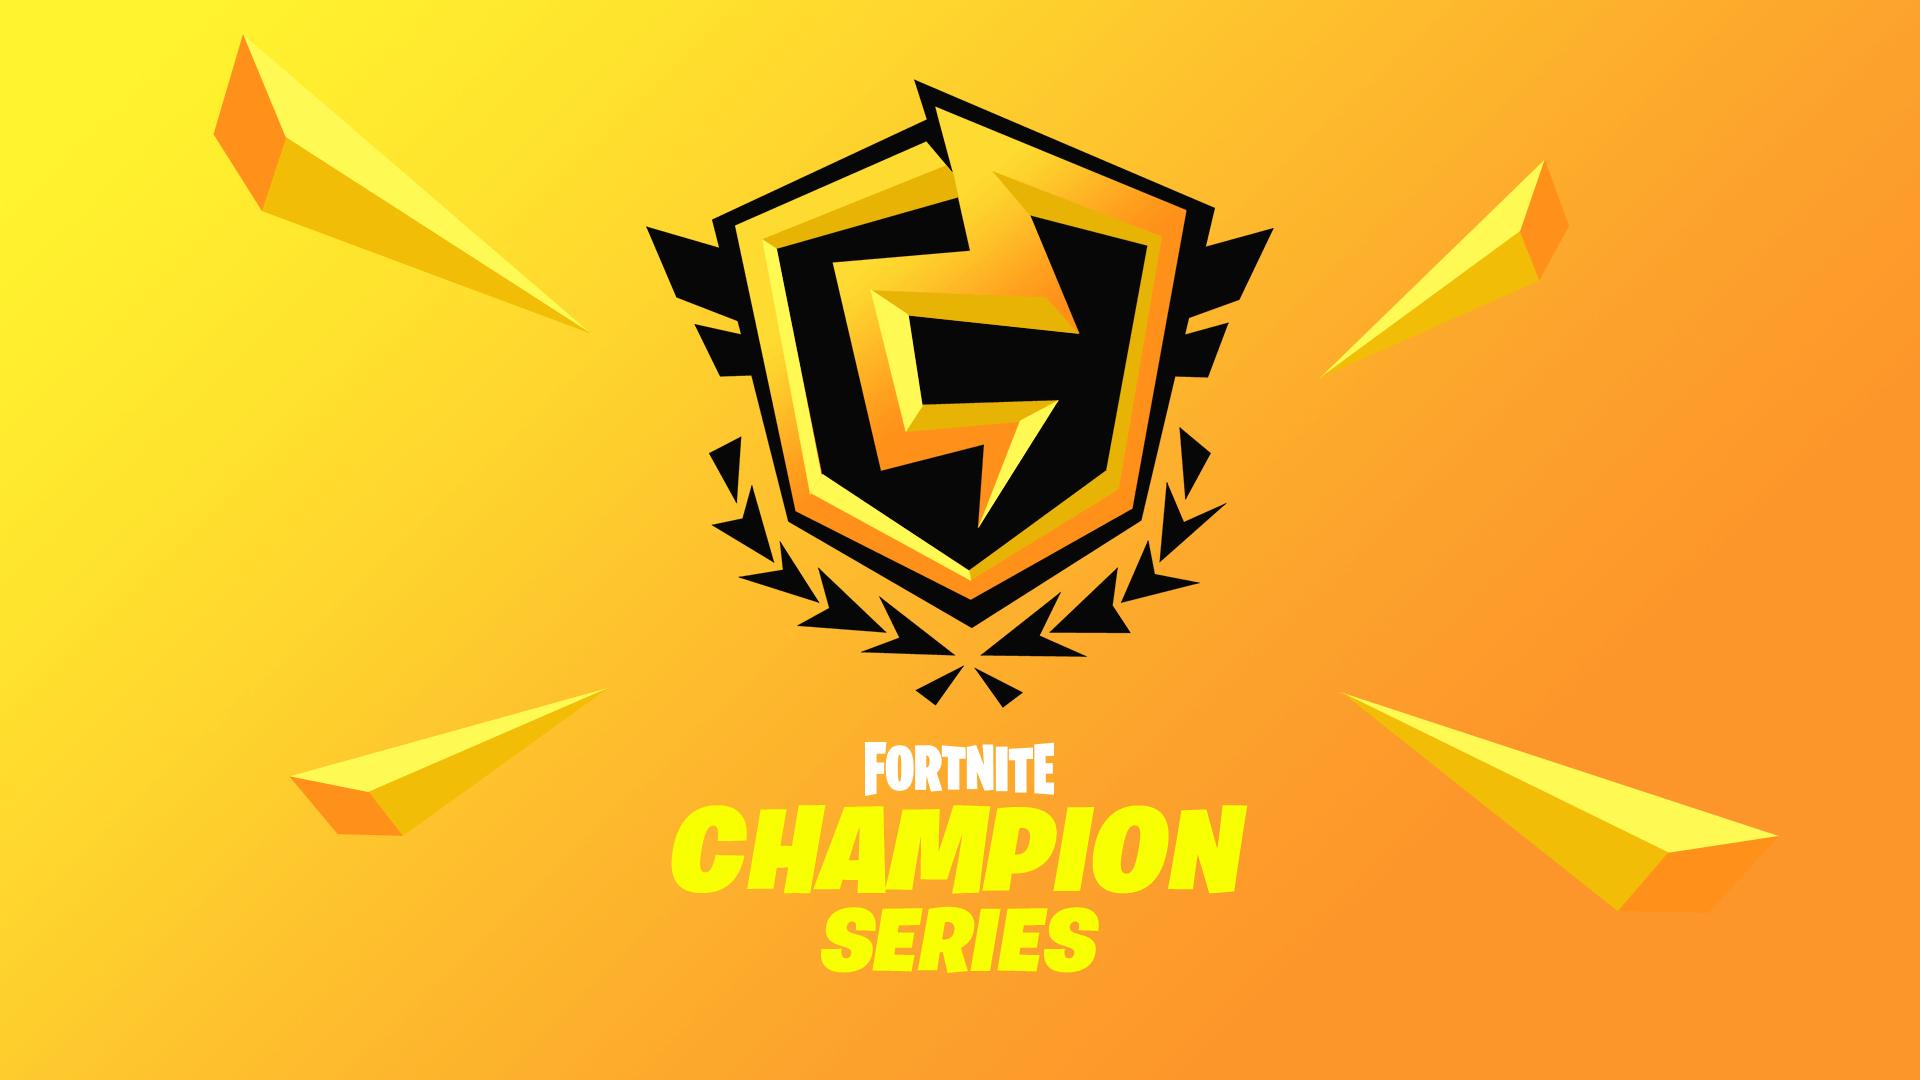 fortnite-champion-series-chapter-2